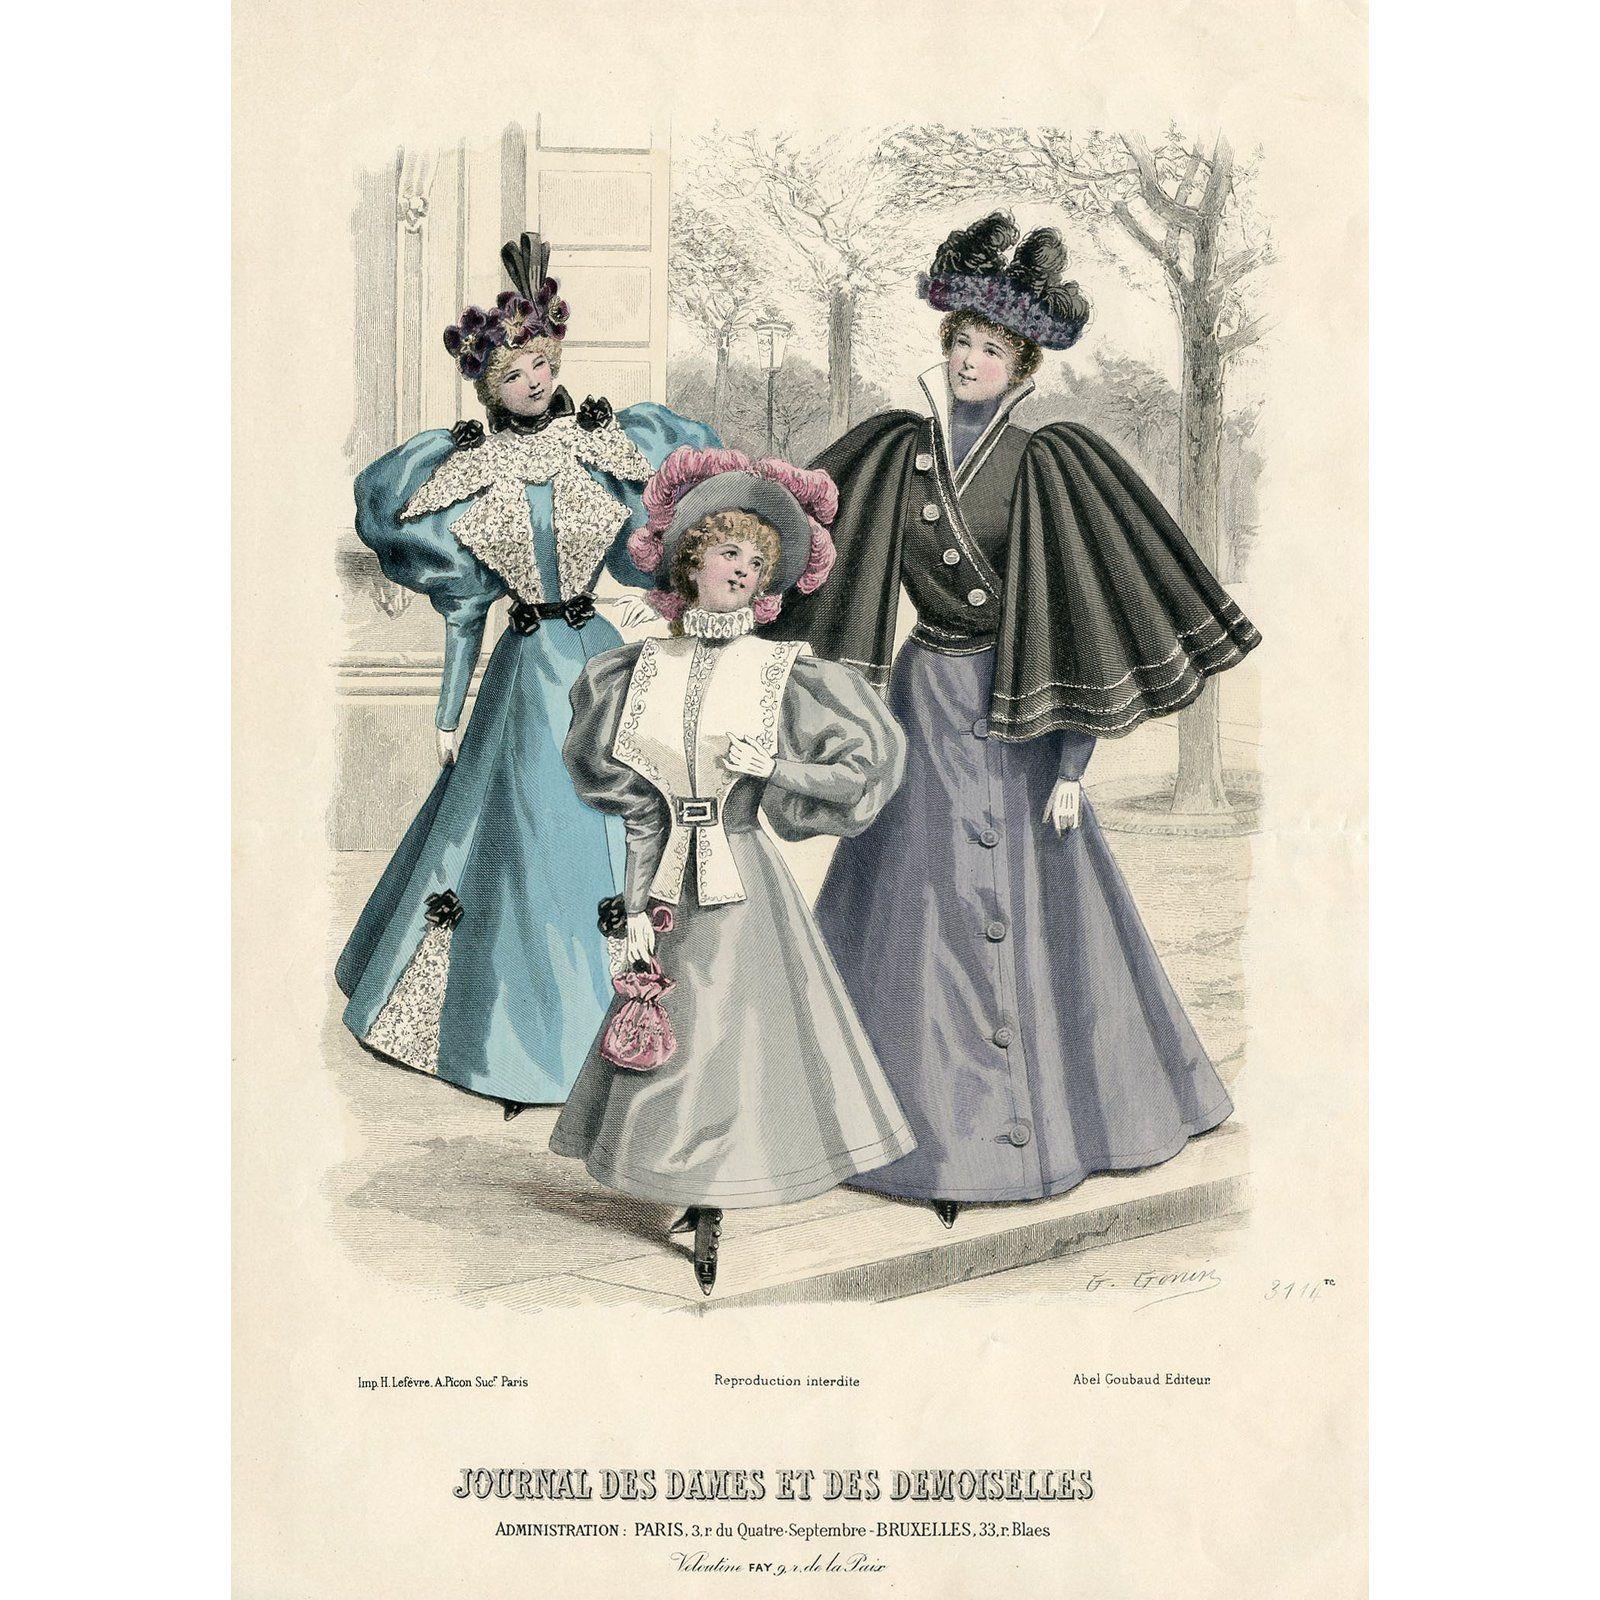 Vintage French Fashion Print 1888 In 2020 French Fashion Fashion Prints Edgy Fashion Grunge